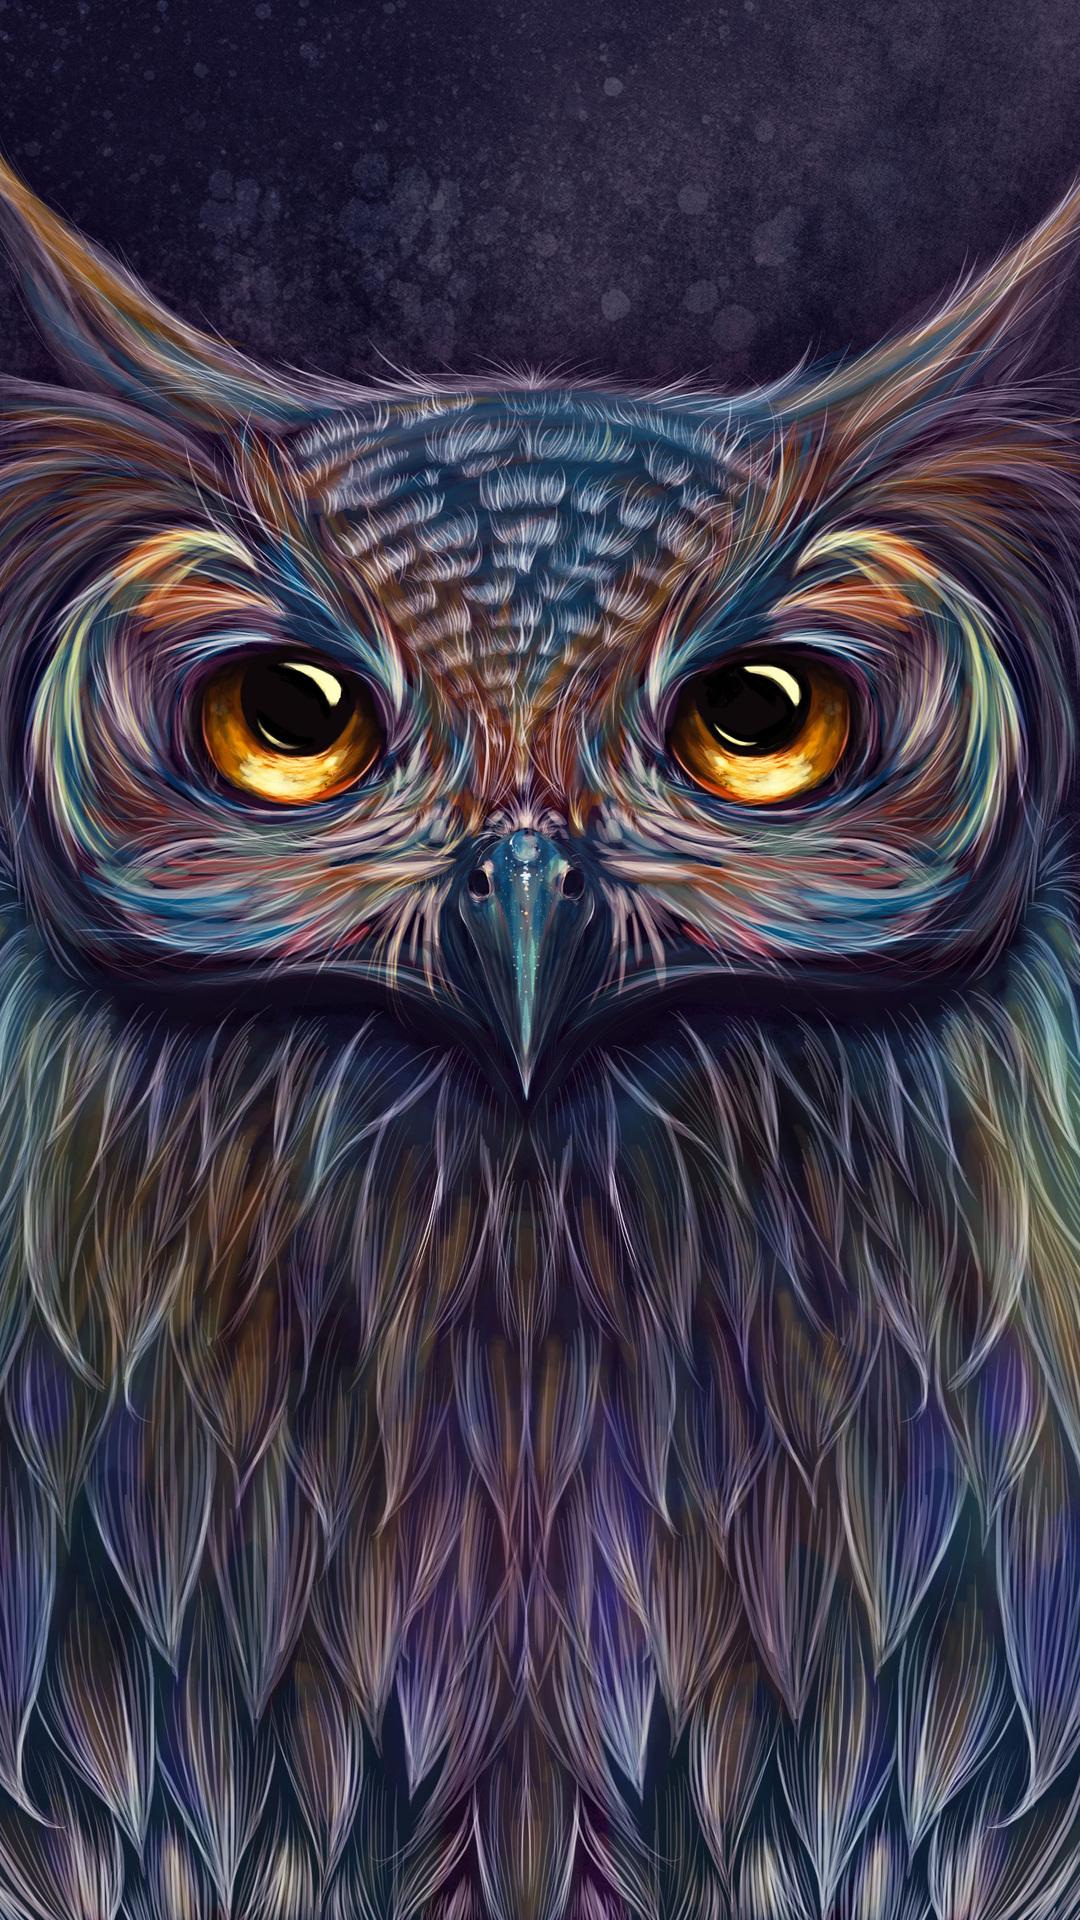 1080x1920 Owl Colorful Art 5k Iphone 7,6s,6 Plus, Pixel xl ...